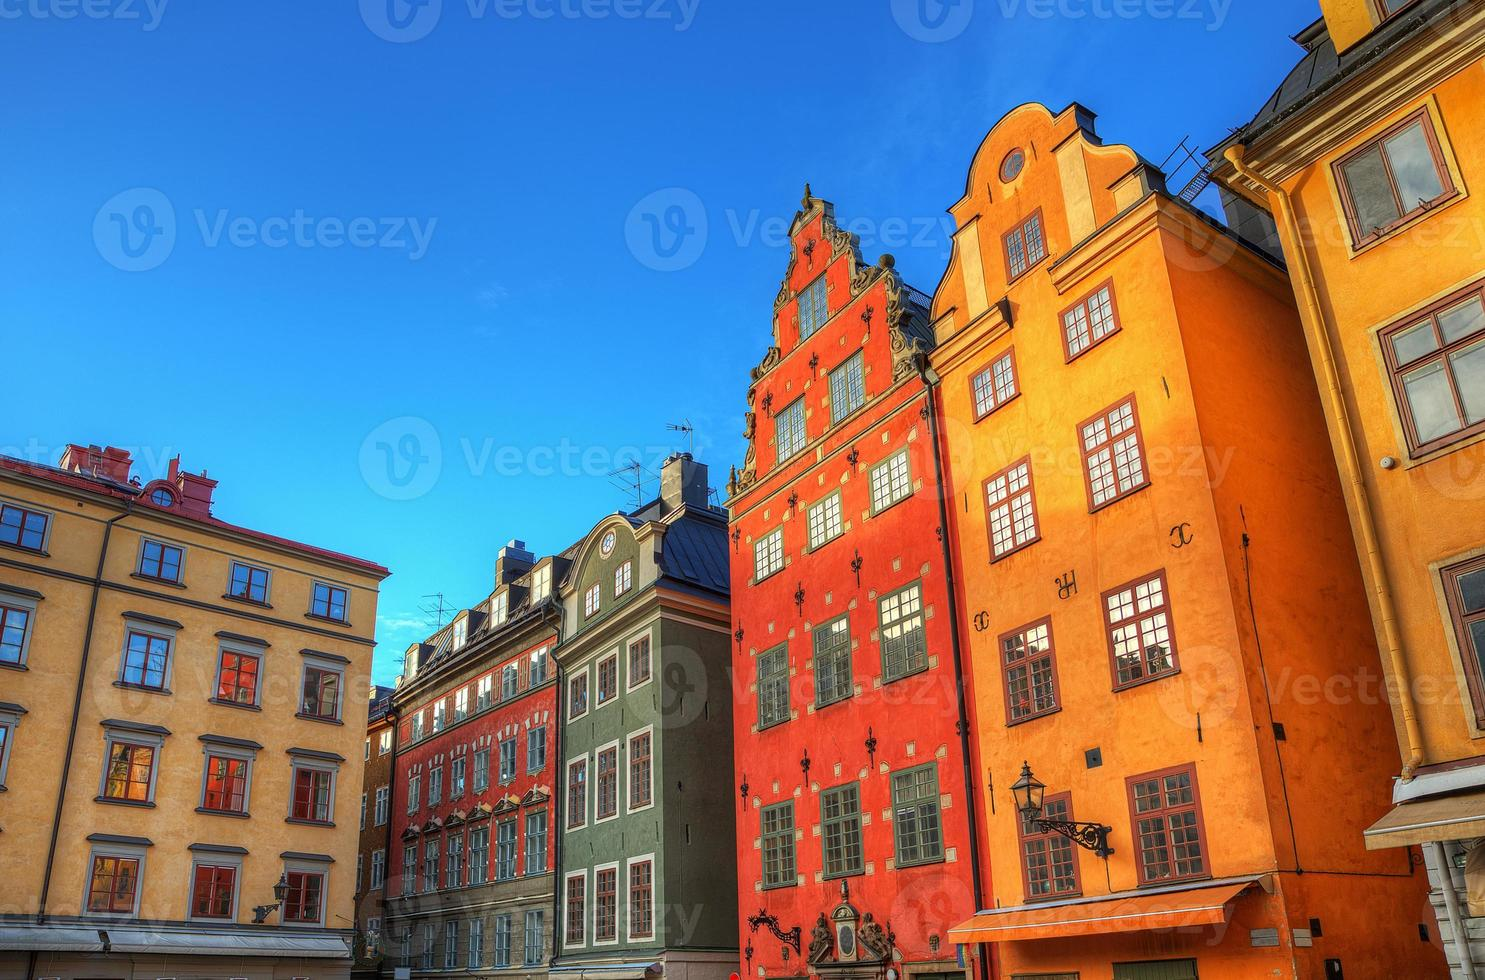 stortorget gamla stan stockholm, hdr image.e. foto